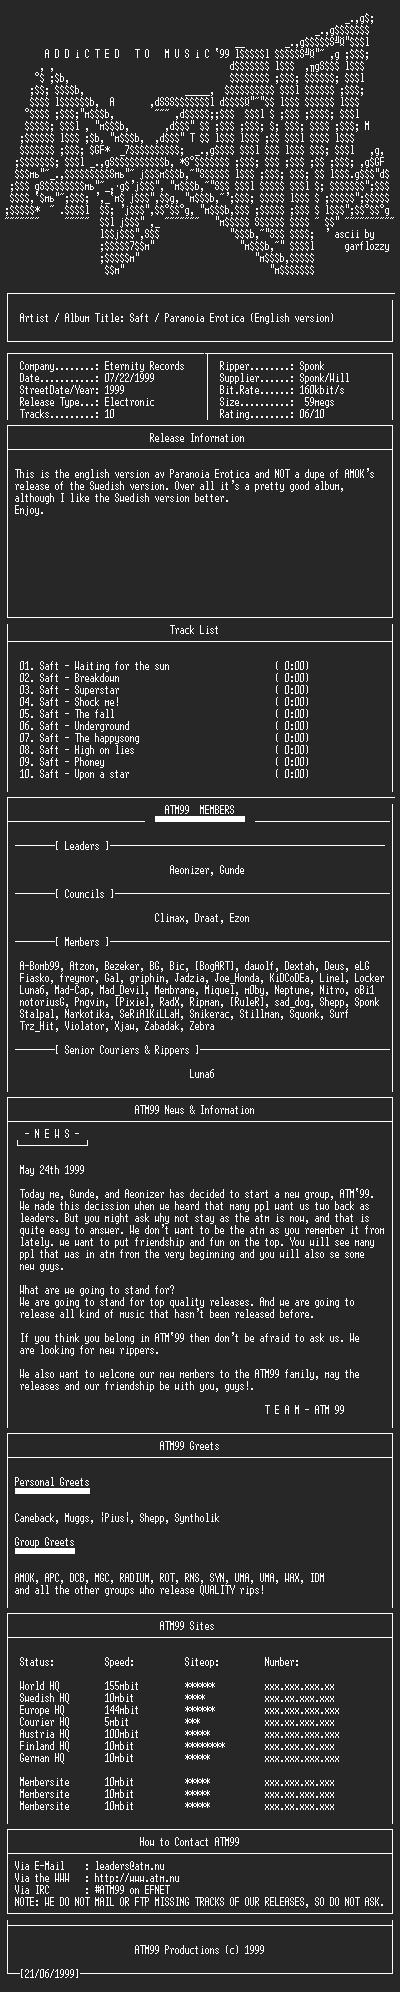 NFO file for Saft_-_Paranoia_Erotica_(1999)_-_ATM99